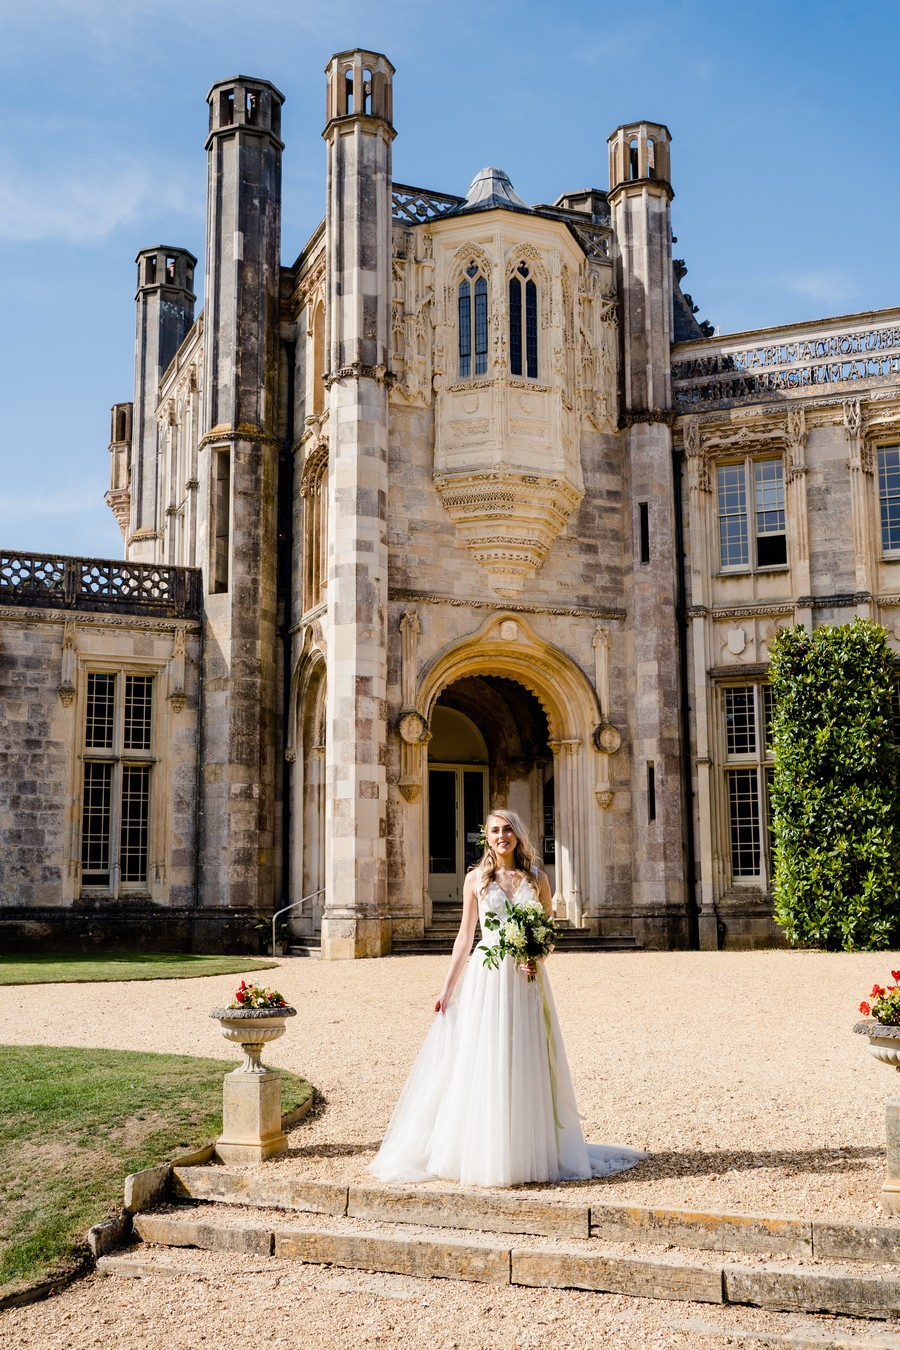 Highcliffe Castle wedding inspiration on the English Wedding Blog (32)